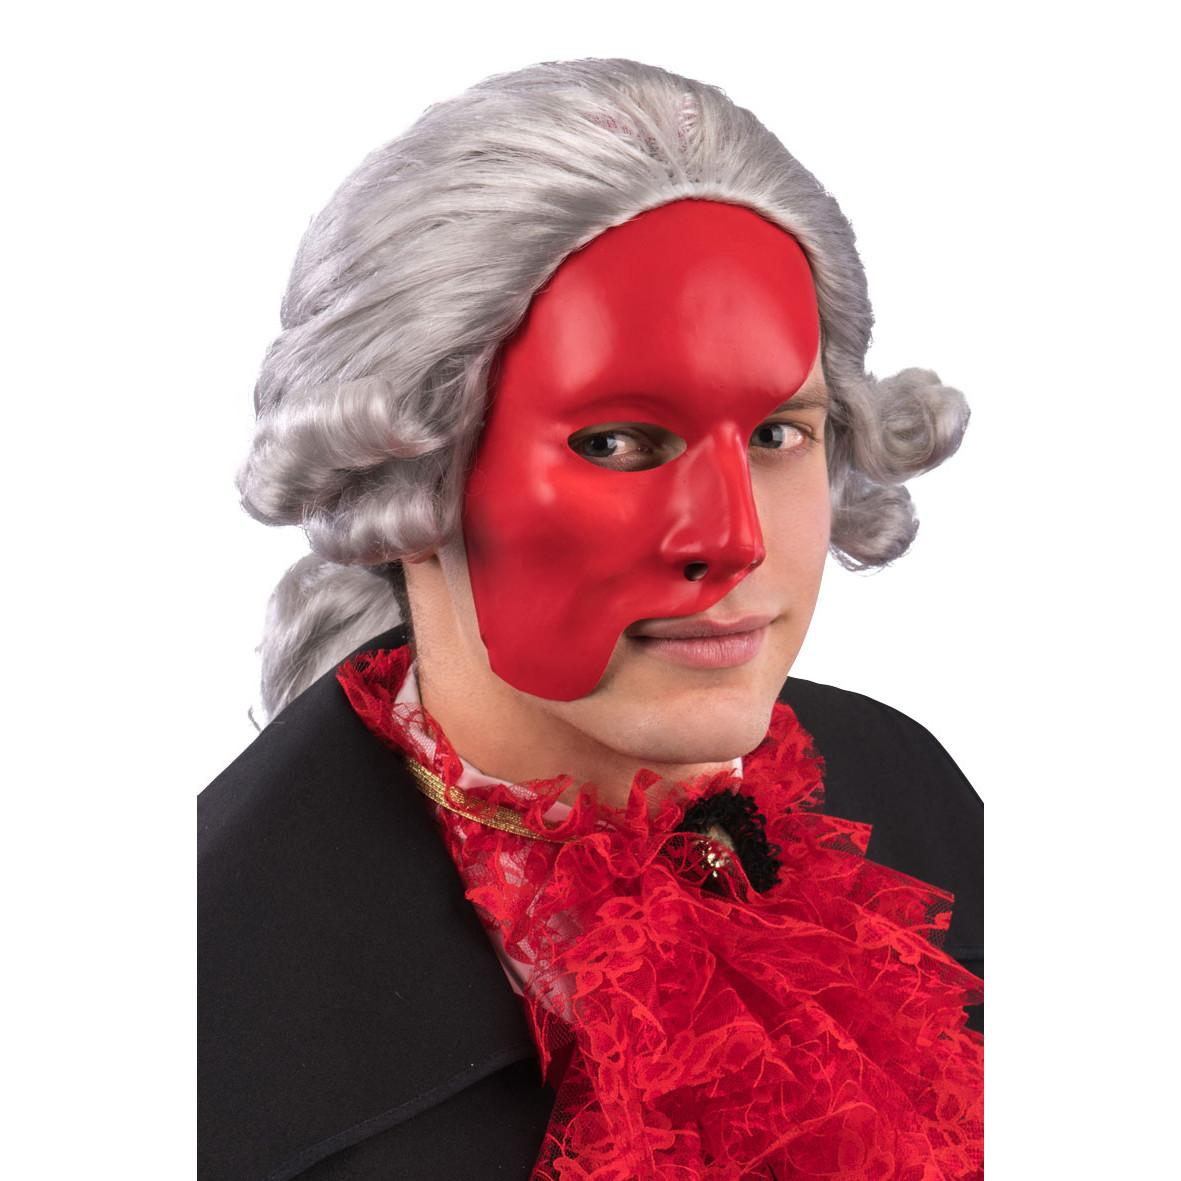 Ansiktsmask - Half face Red Phantom of the opera mask